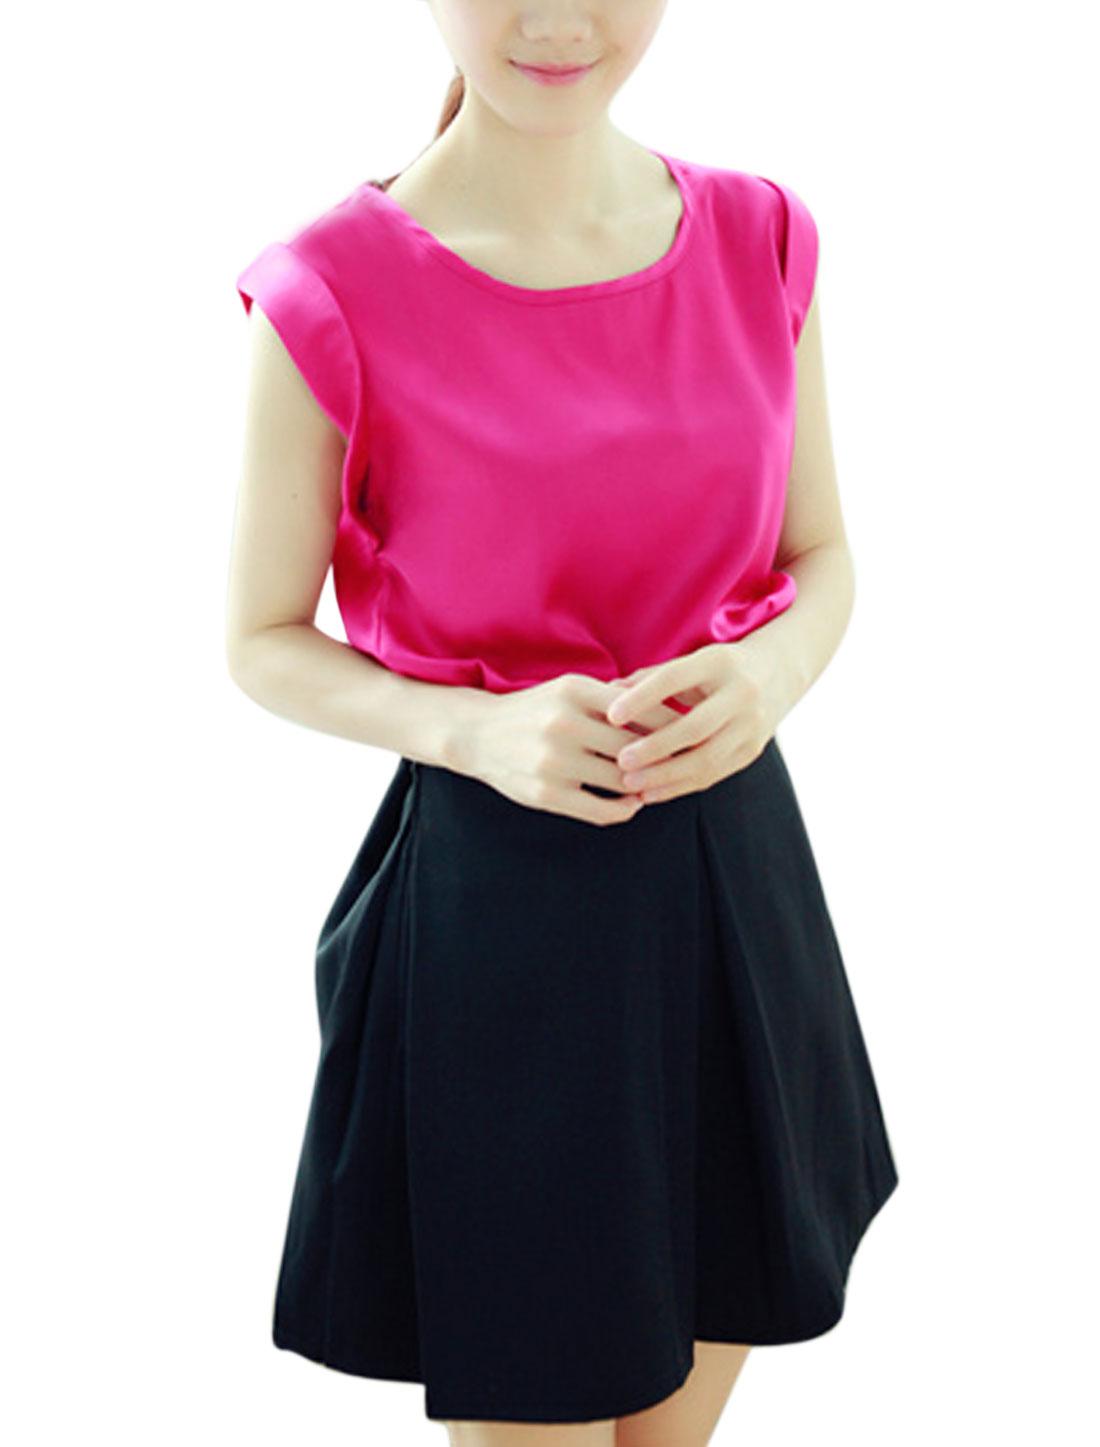 Women Elegant Soft Round Neck Slipover Design Satin Blouse Fuchsia XS